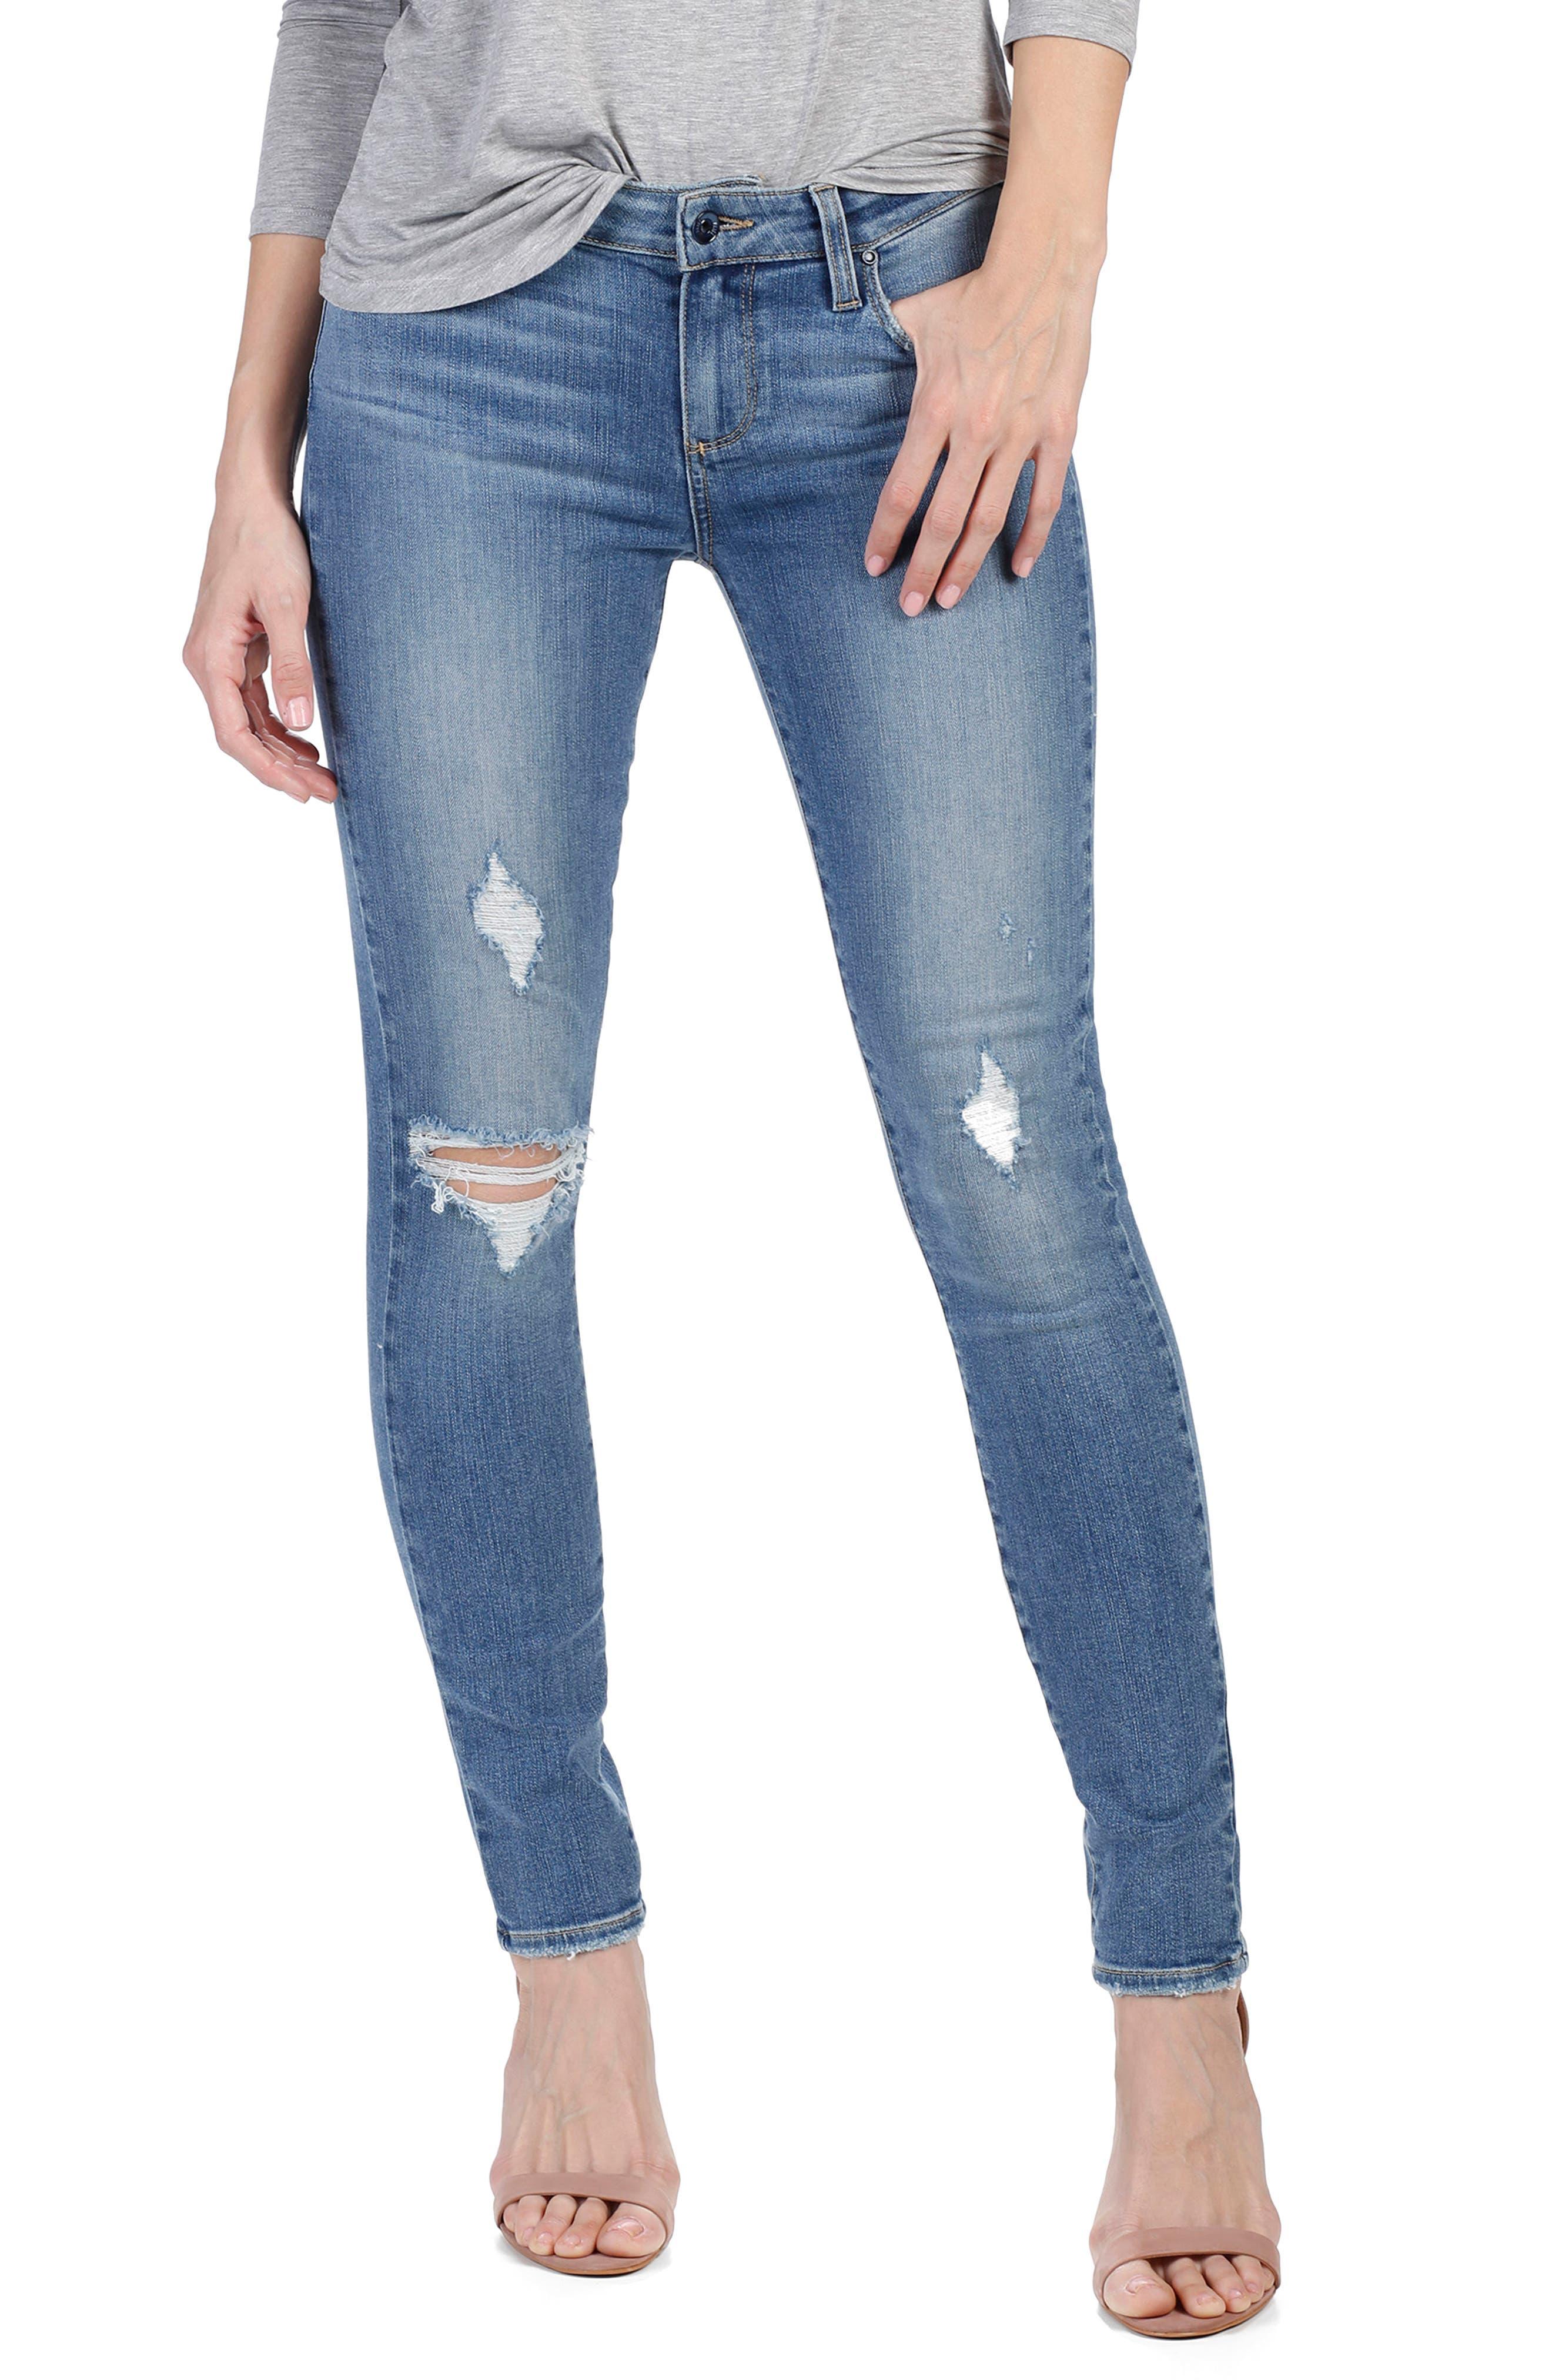 Main Image - PAIGE Transcend - Verdugo Ultra Skinny Jeans (Sienna Destructed)